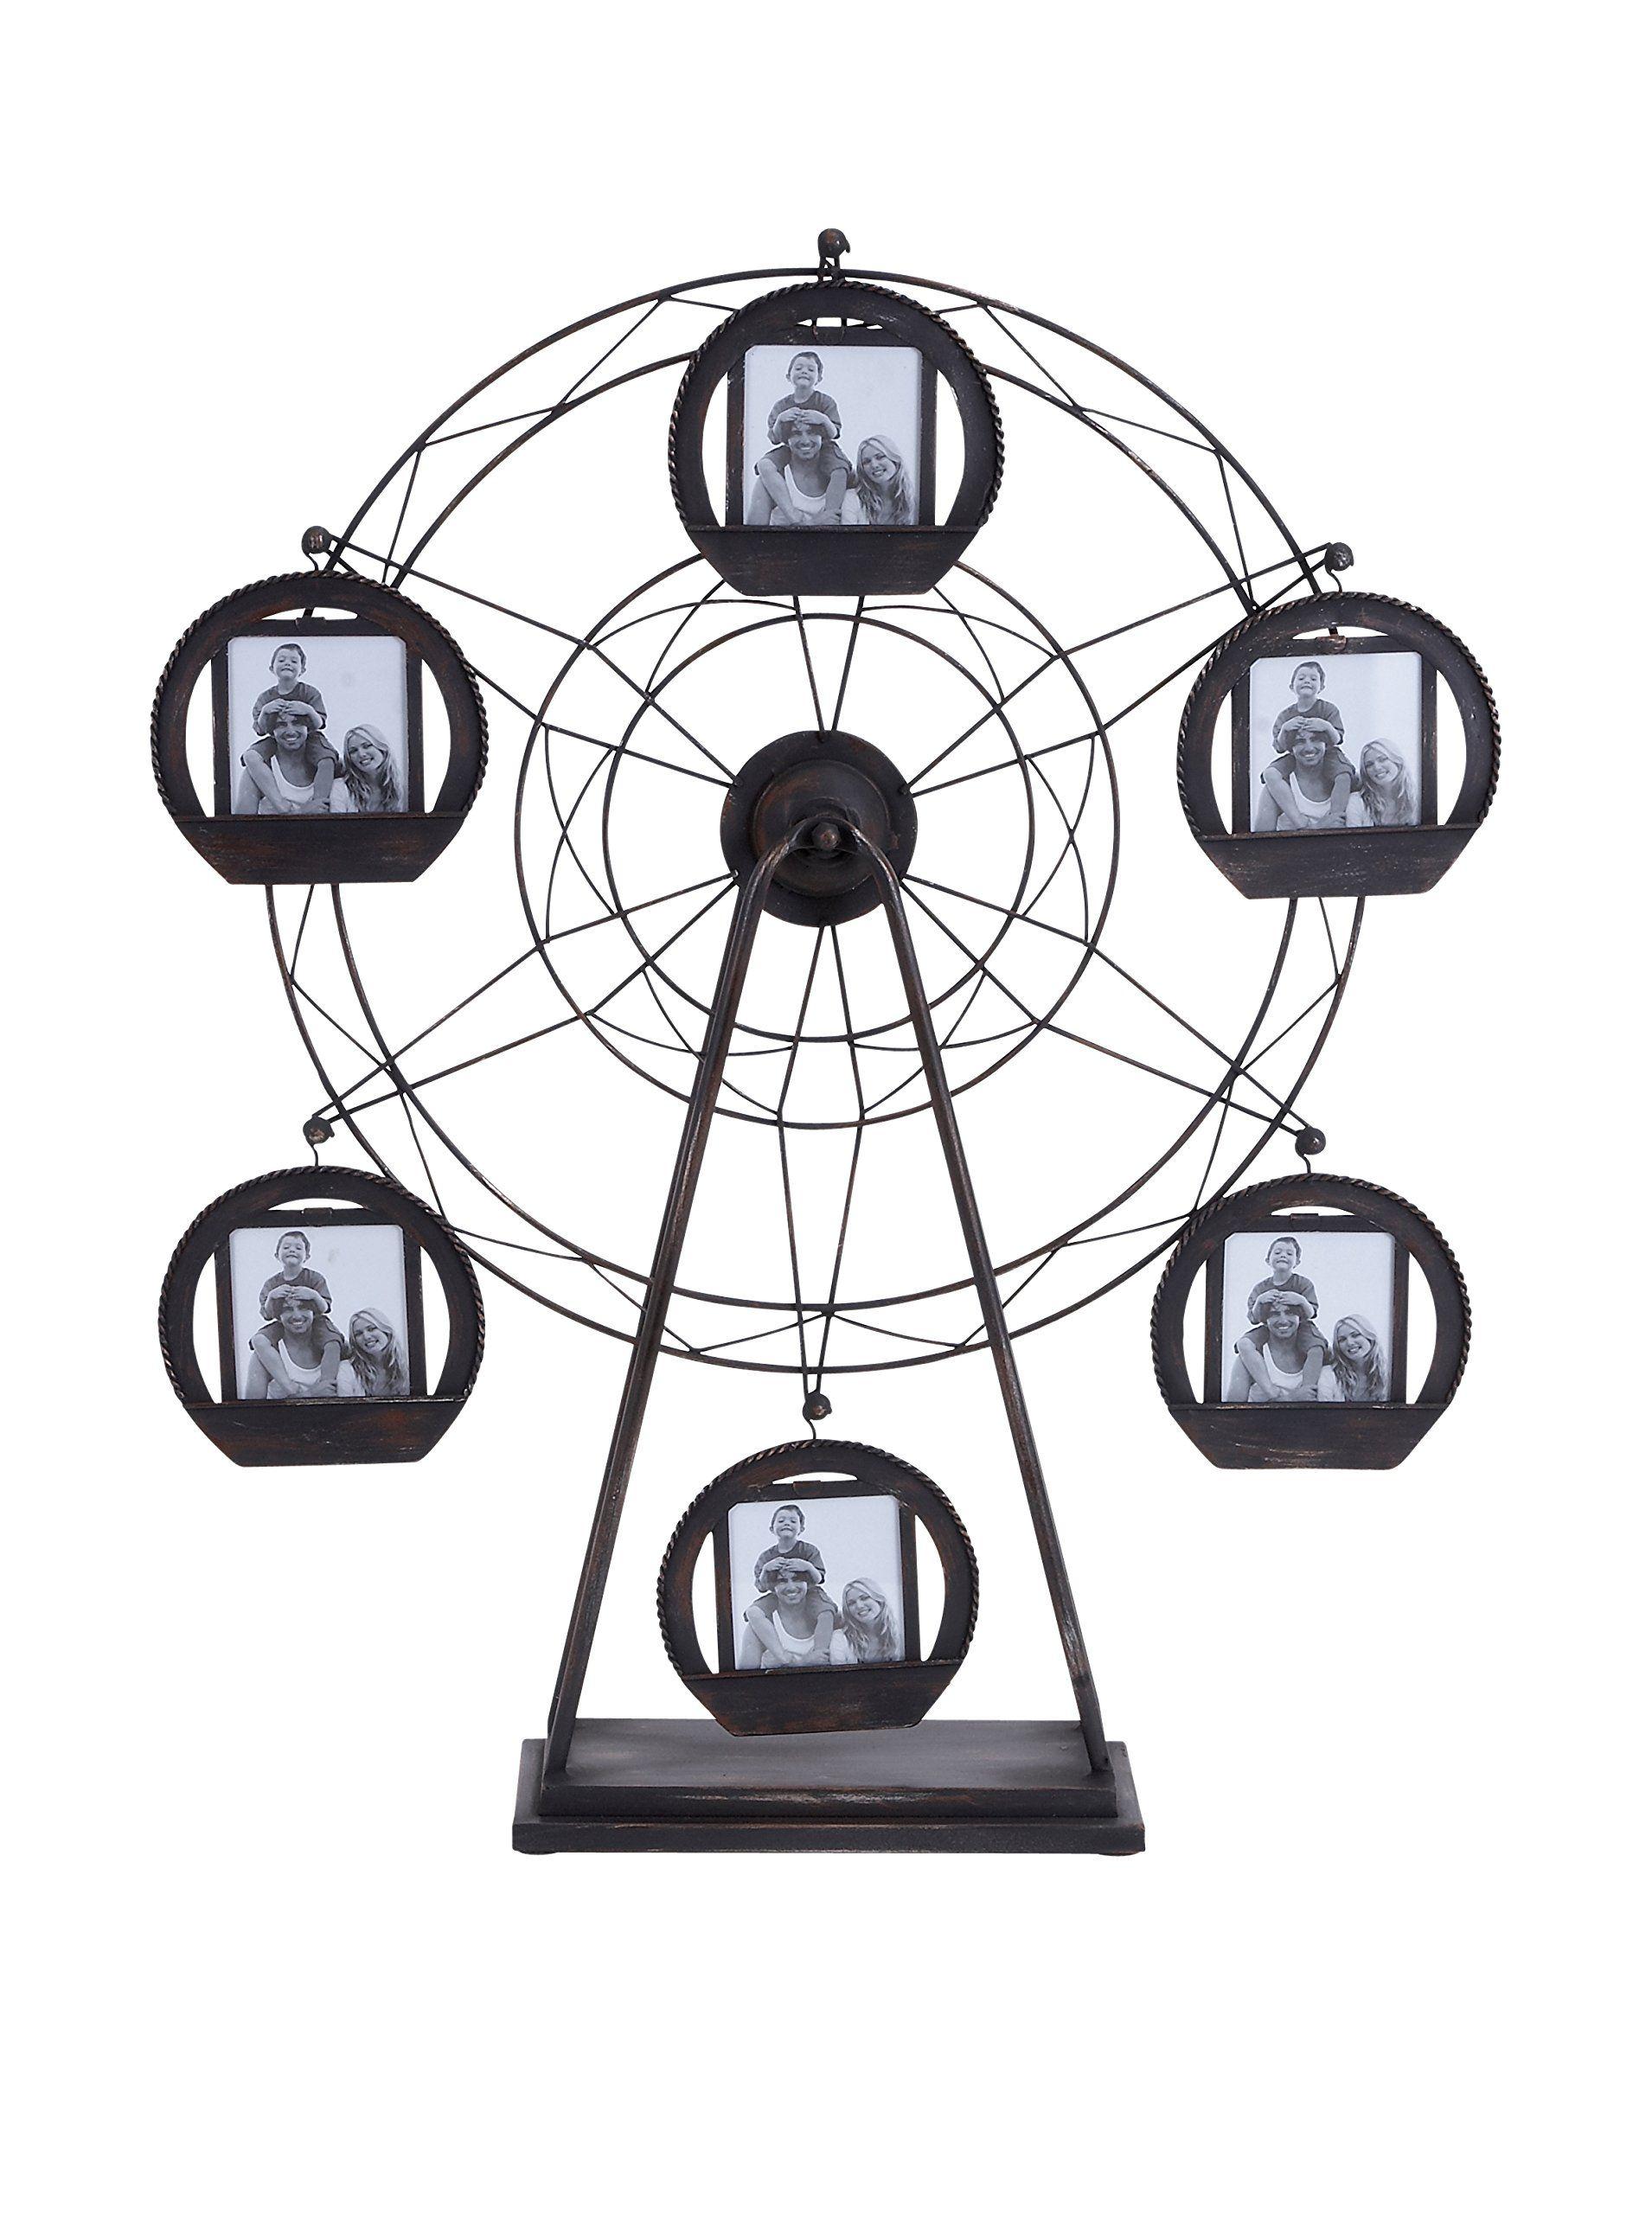 Benzara Ferris Wheel 6-Photo Frame at MYHABIT | ⊱•⛅•⛲• Mirrors ...